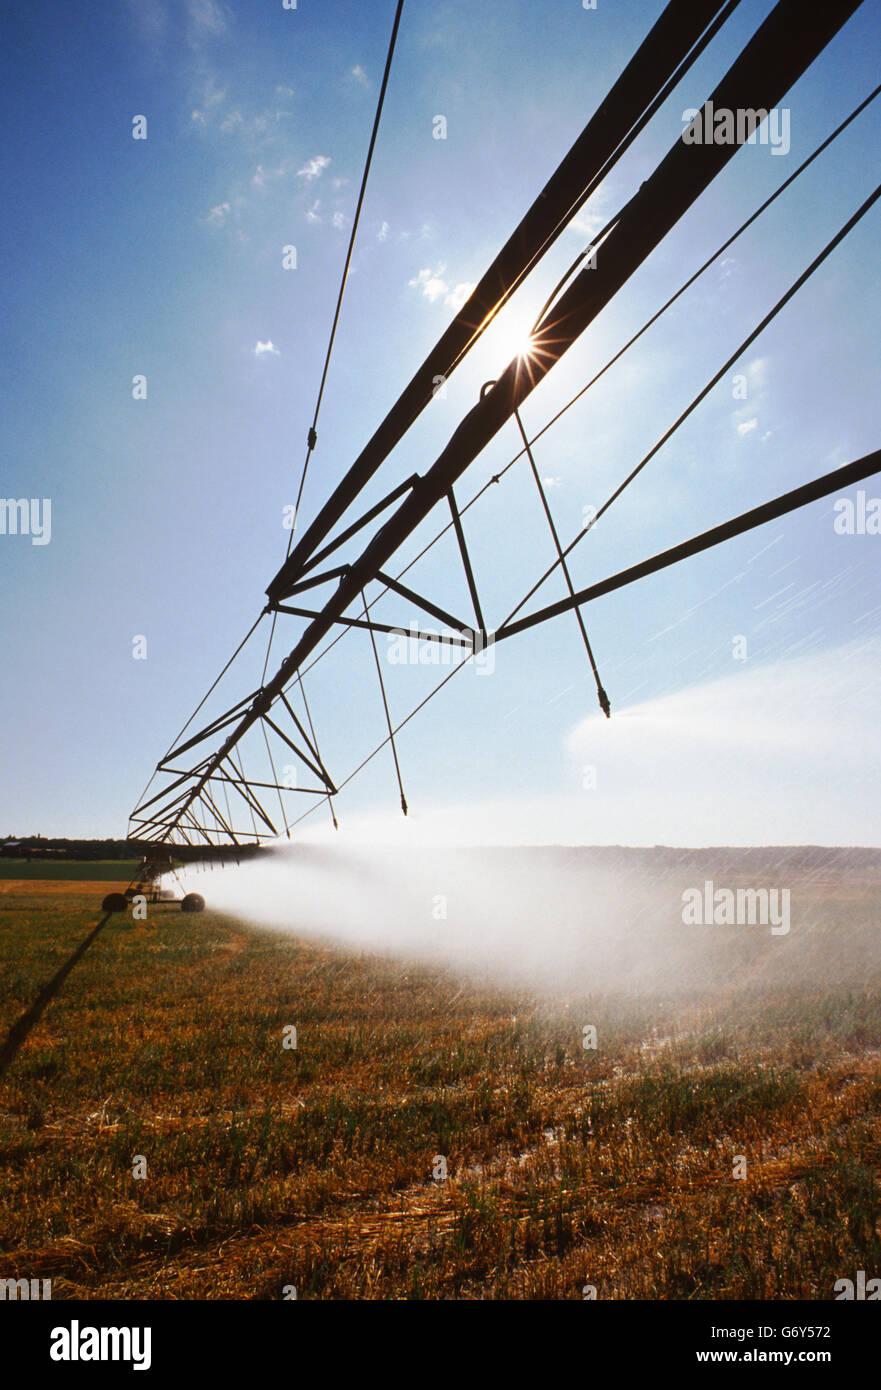 Irrigation equipment spraying water on farm fields near Cortez, Colorado, USA - Stock Image